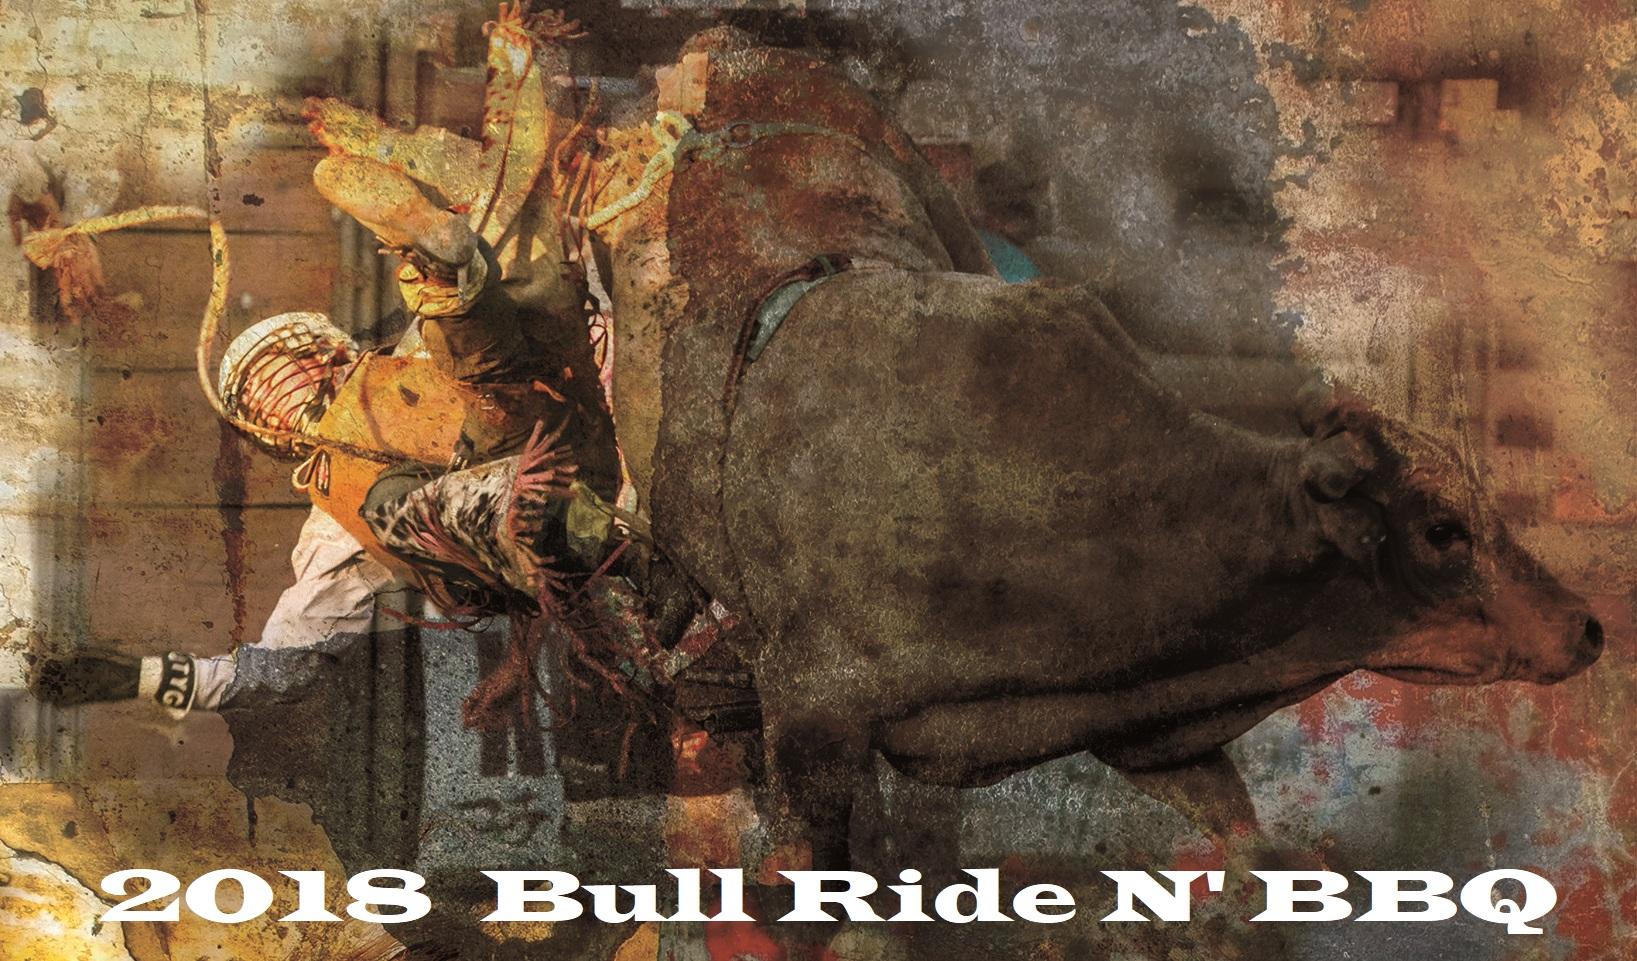 2018 PBR Bull Ride N' BBQ